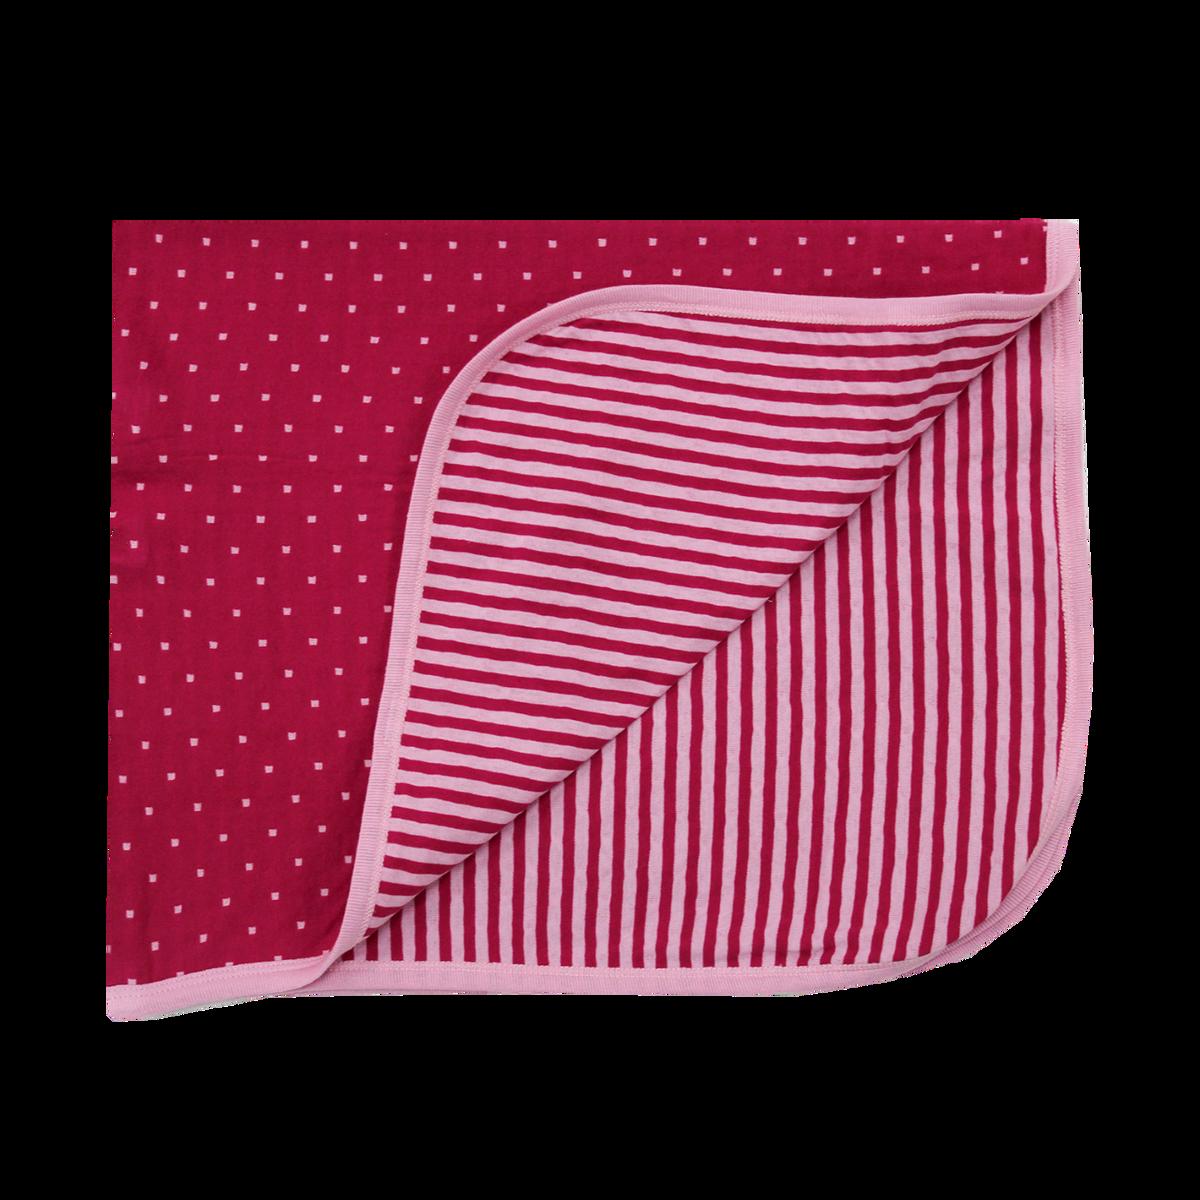 Coccoli DoubleKnit   Blanket   One Size   R4123-264